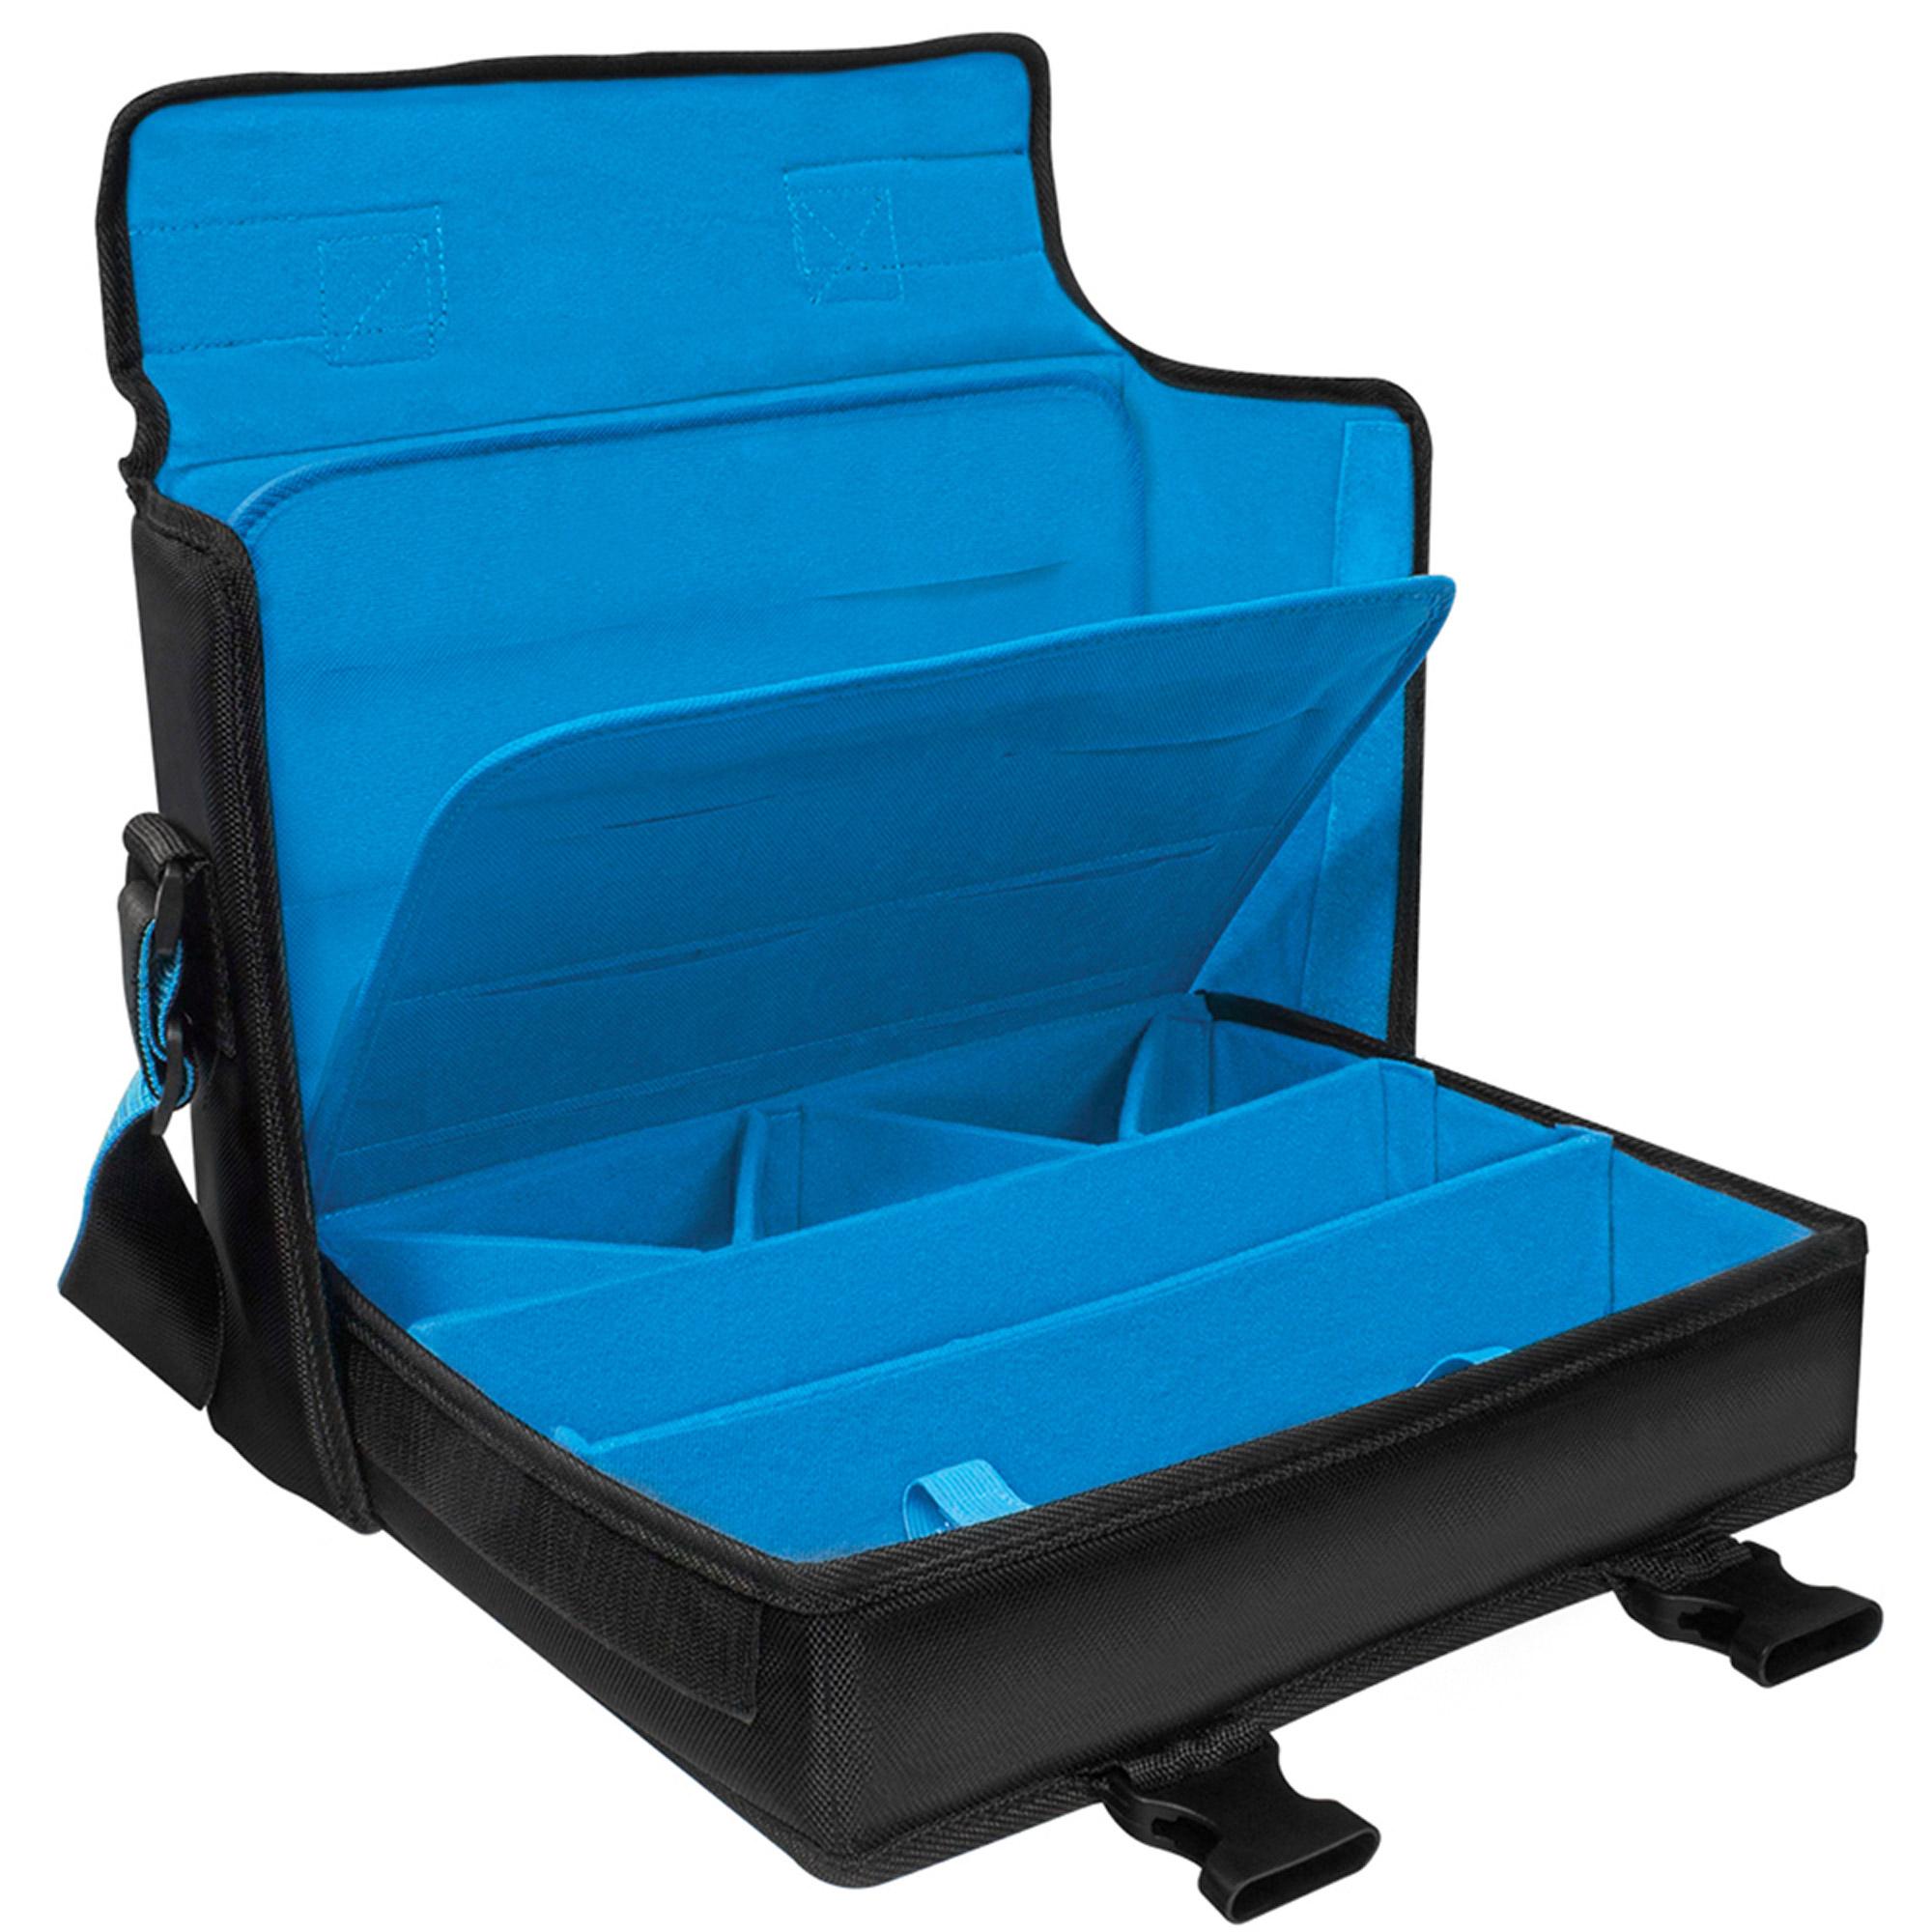 Hyperkin M07107 PS4 Travel Bag, Black